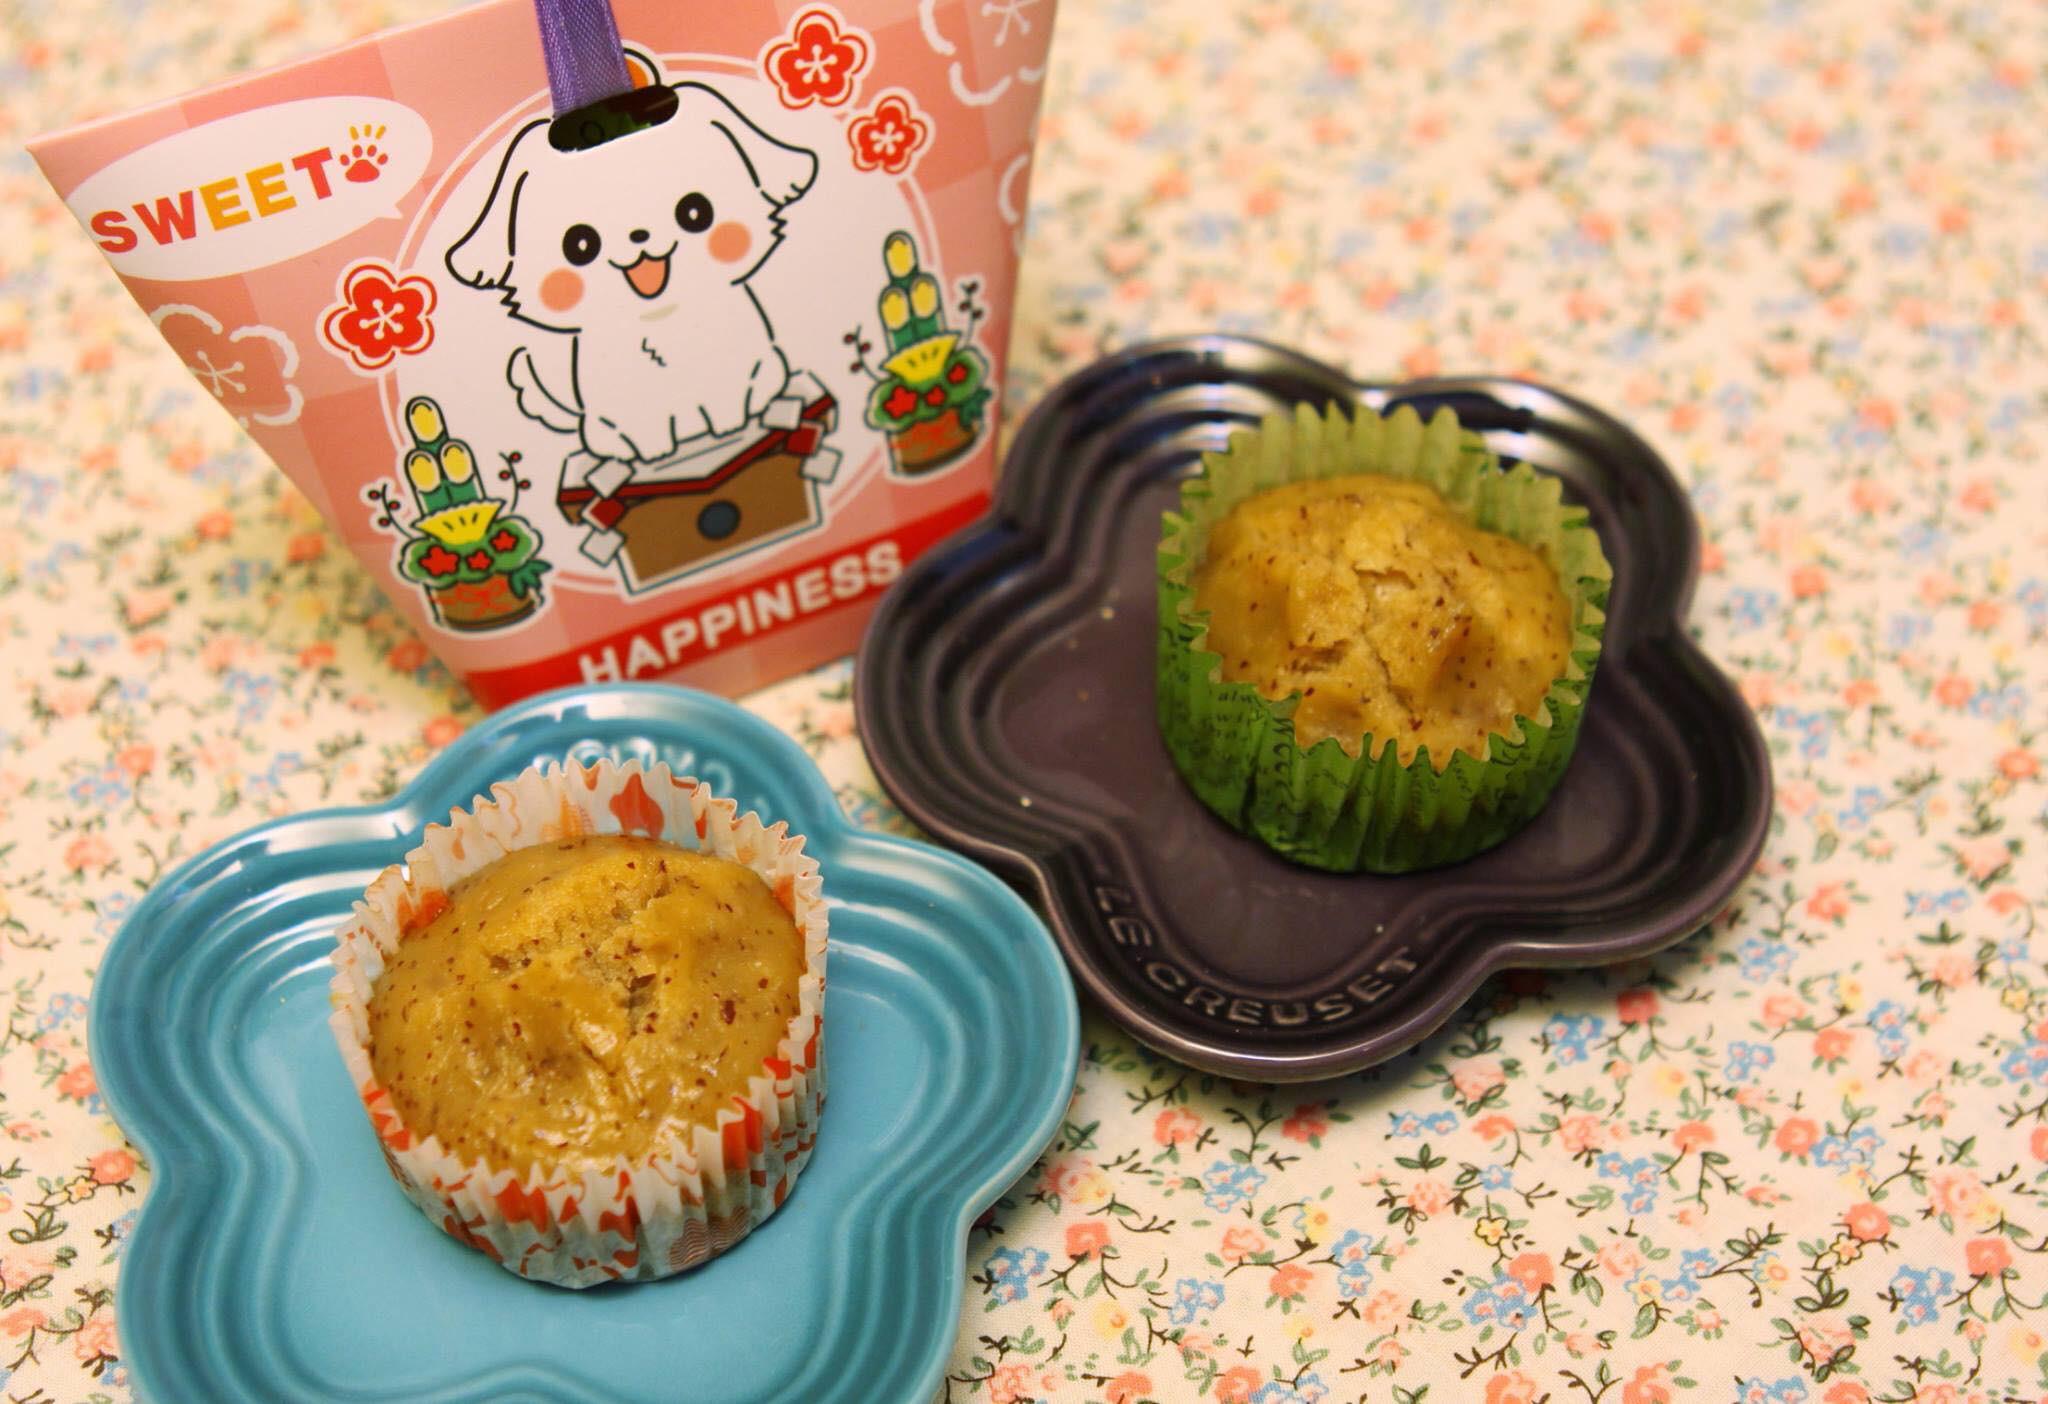 紅棗發糕 steamed cake